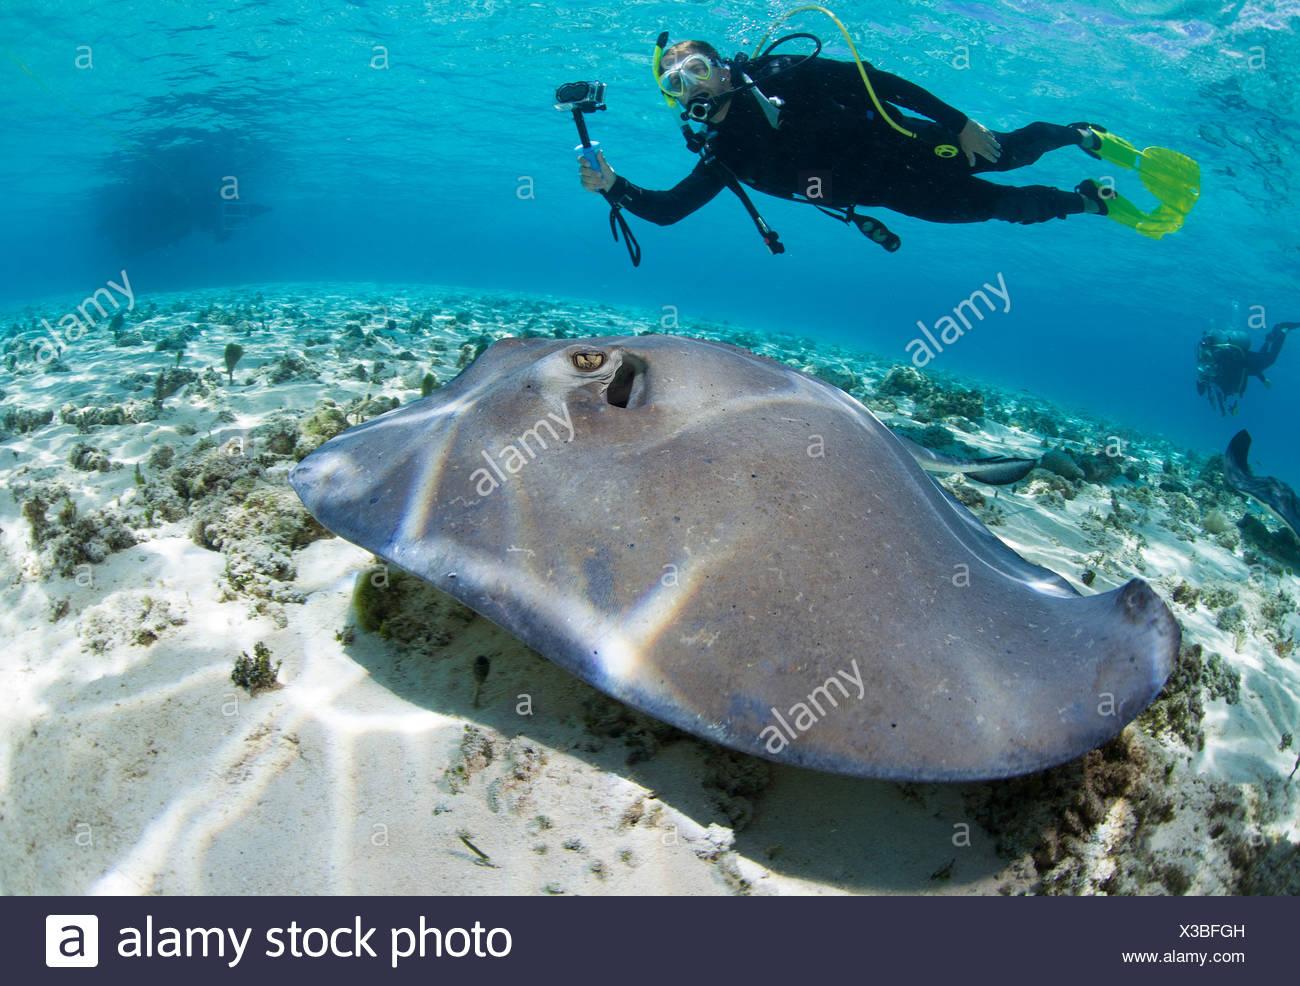 Diver observes stingray. - Stock Image